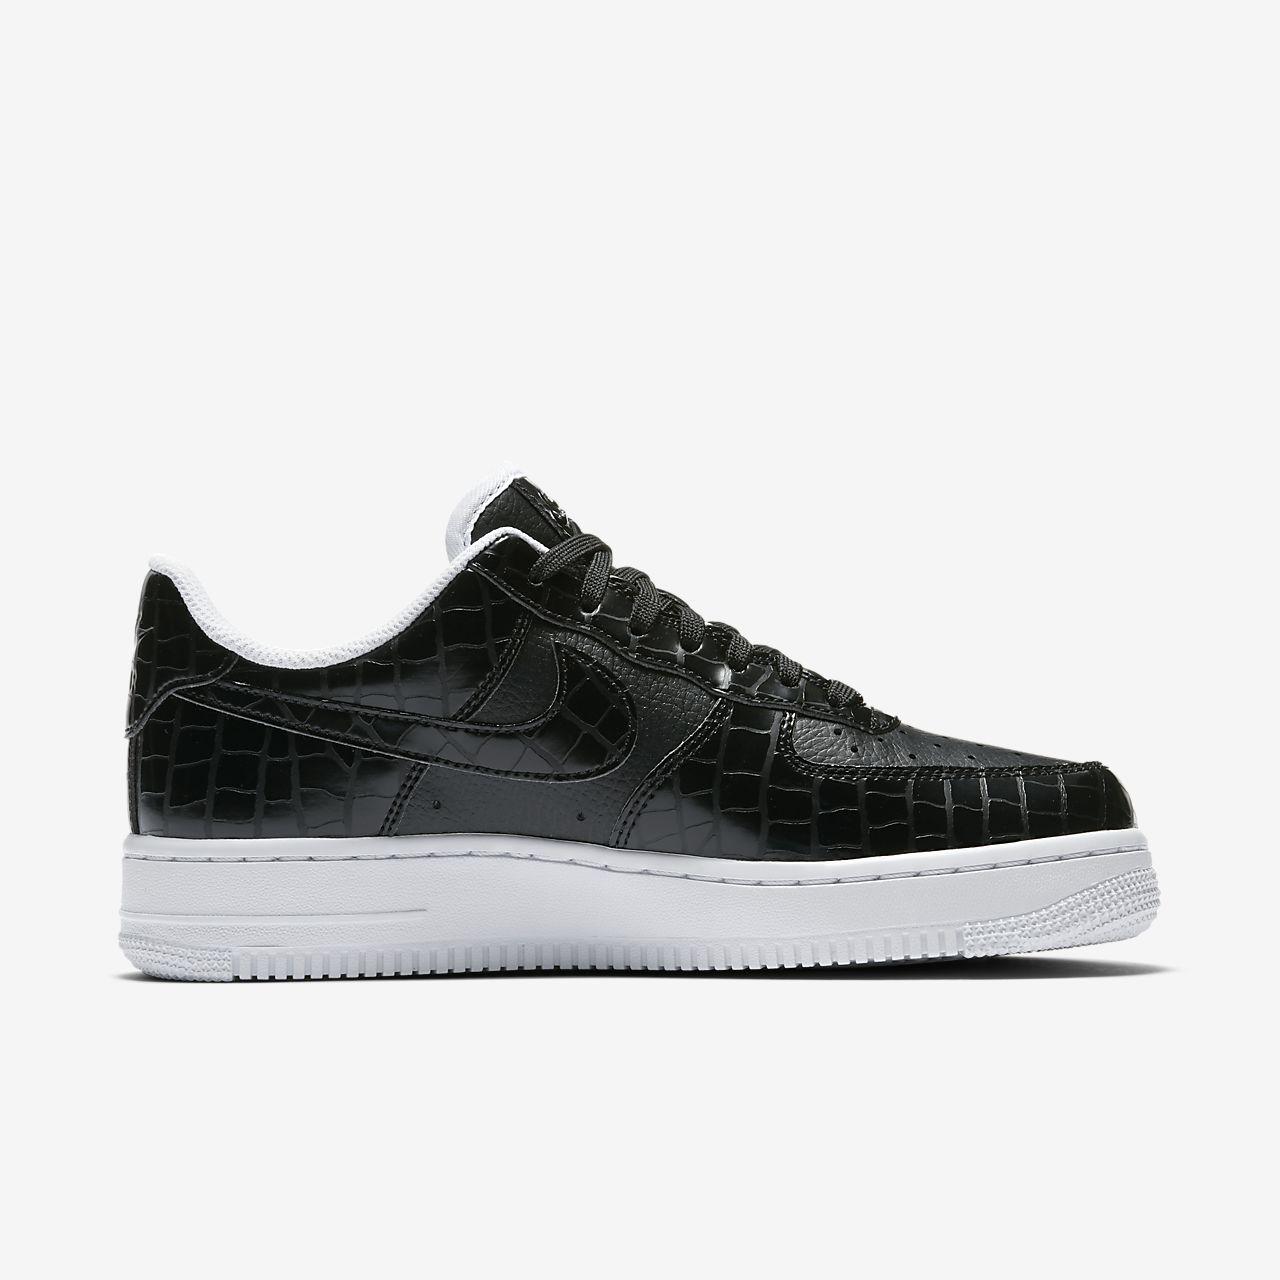 Nike Air Force 1 '07, Herren Sneakers, Schwarz (black/black), 40.5 Eu